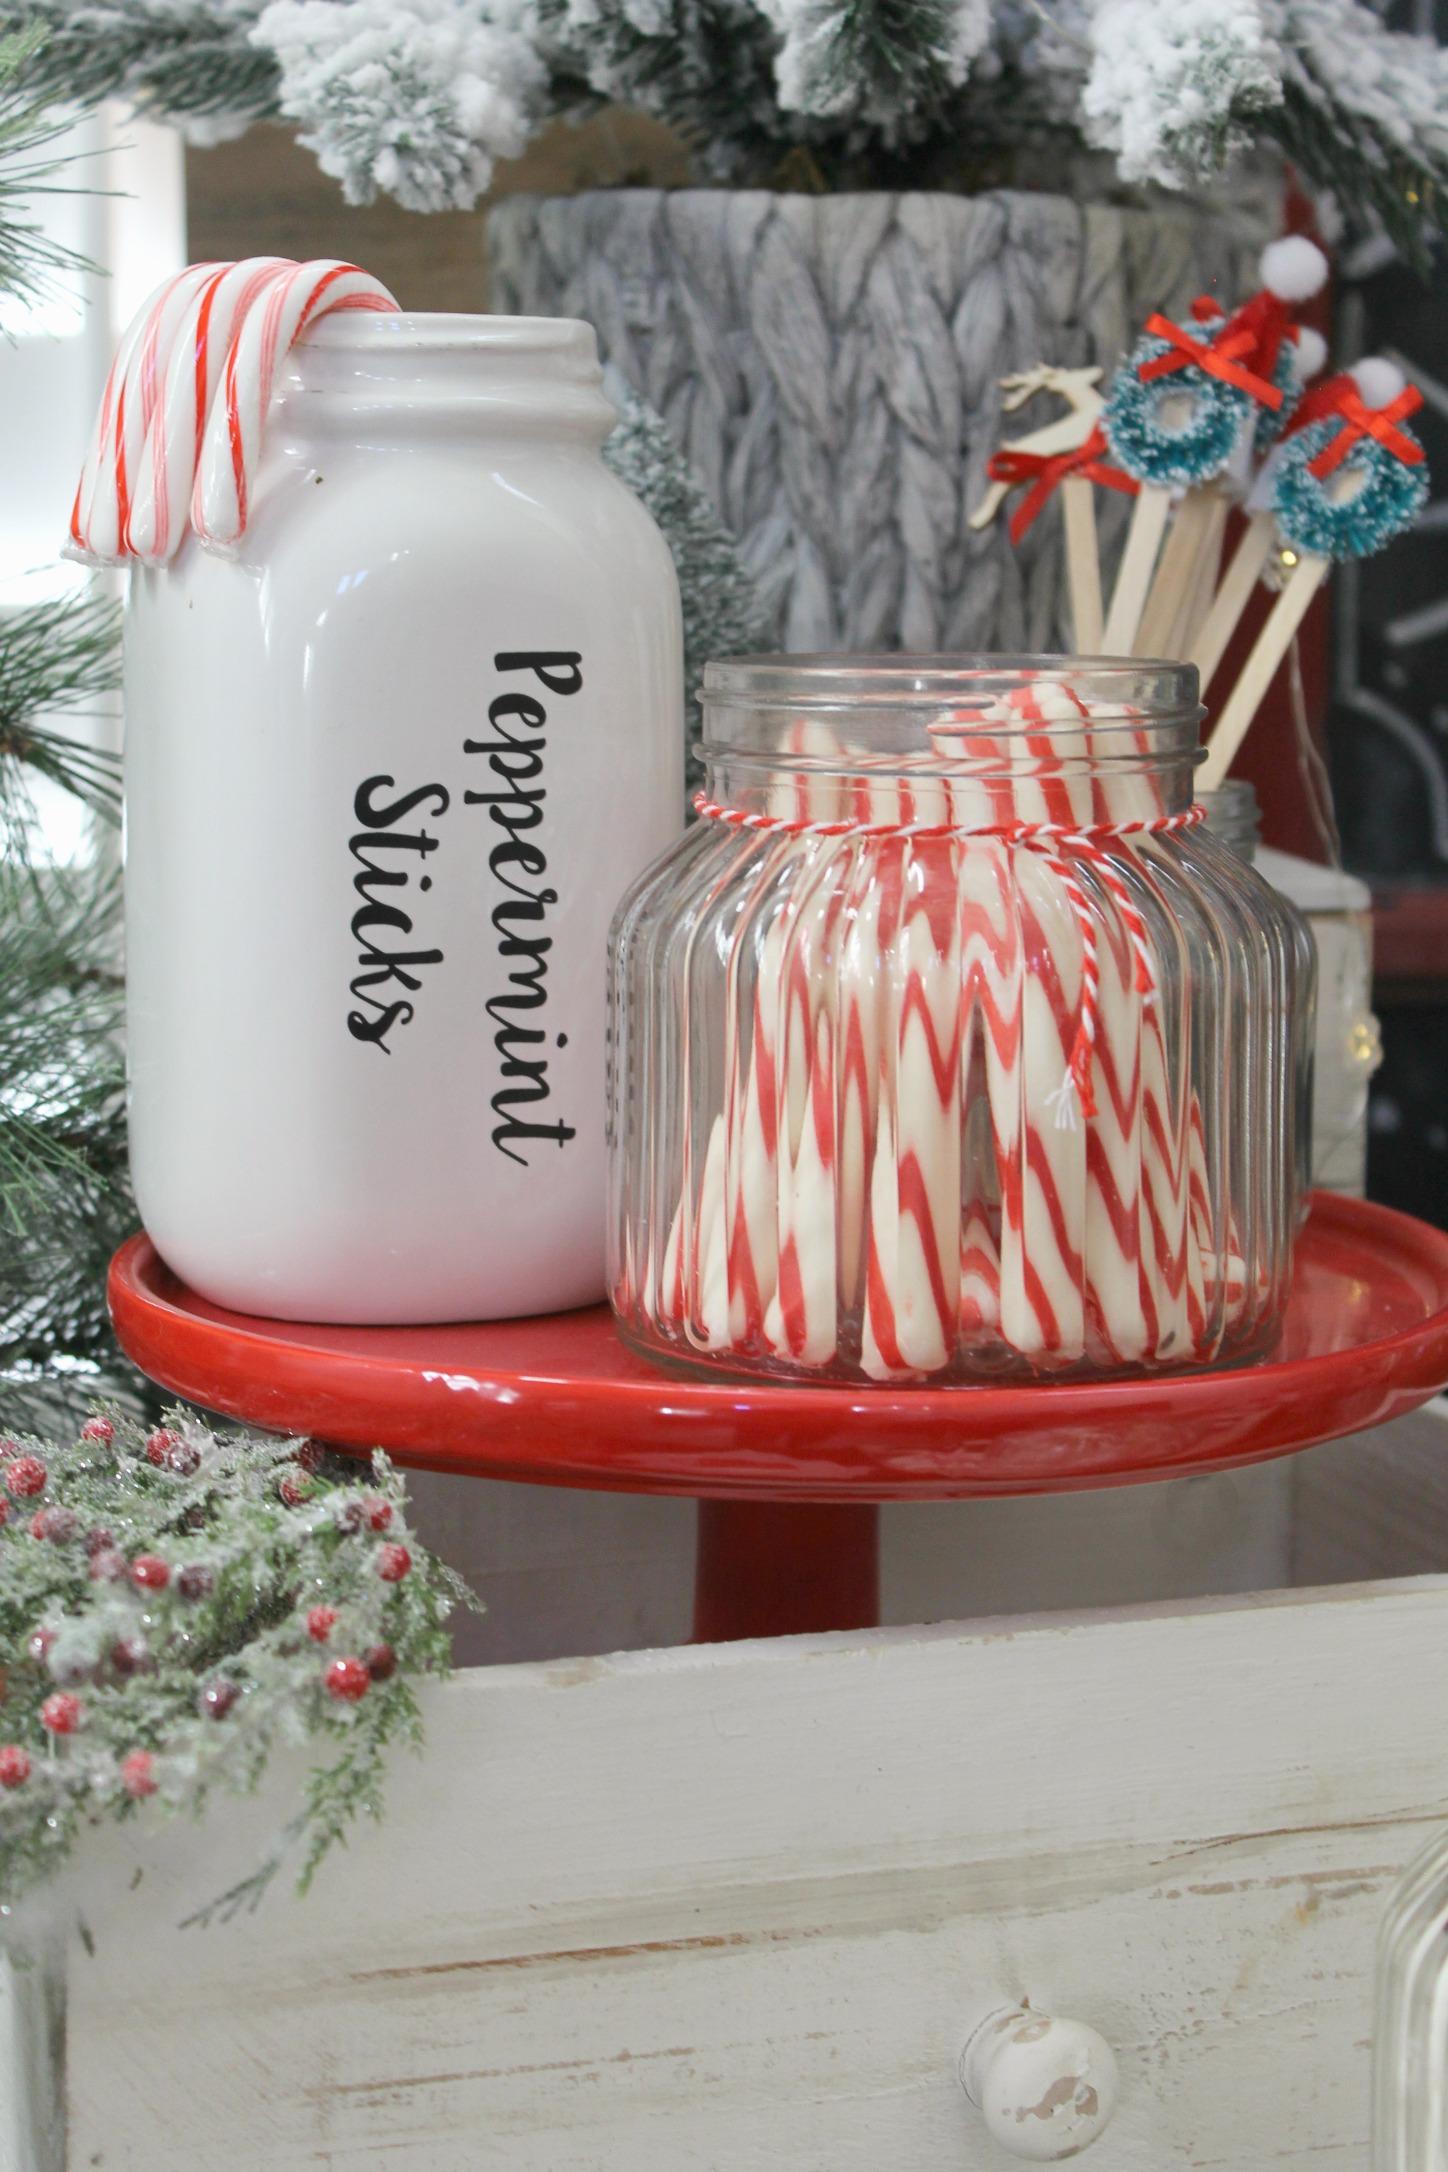 Hot Cocoa Bar-Peppermint Sticks-SugarPartiesLA.com-HotCocoabarideas.jpg